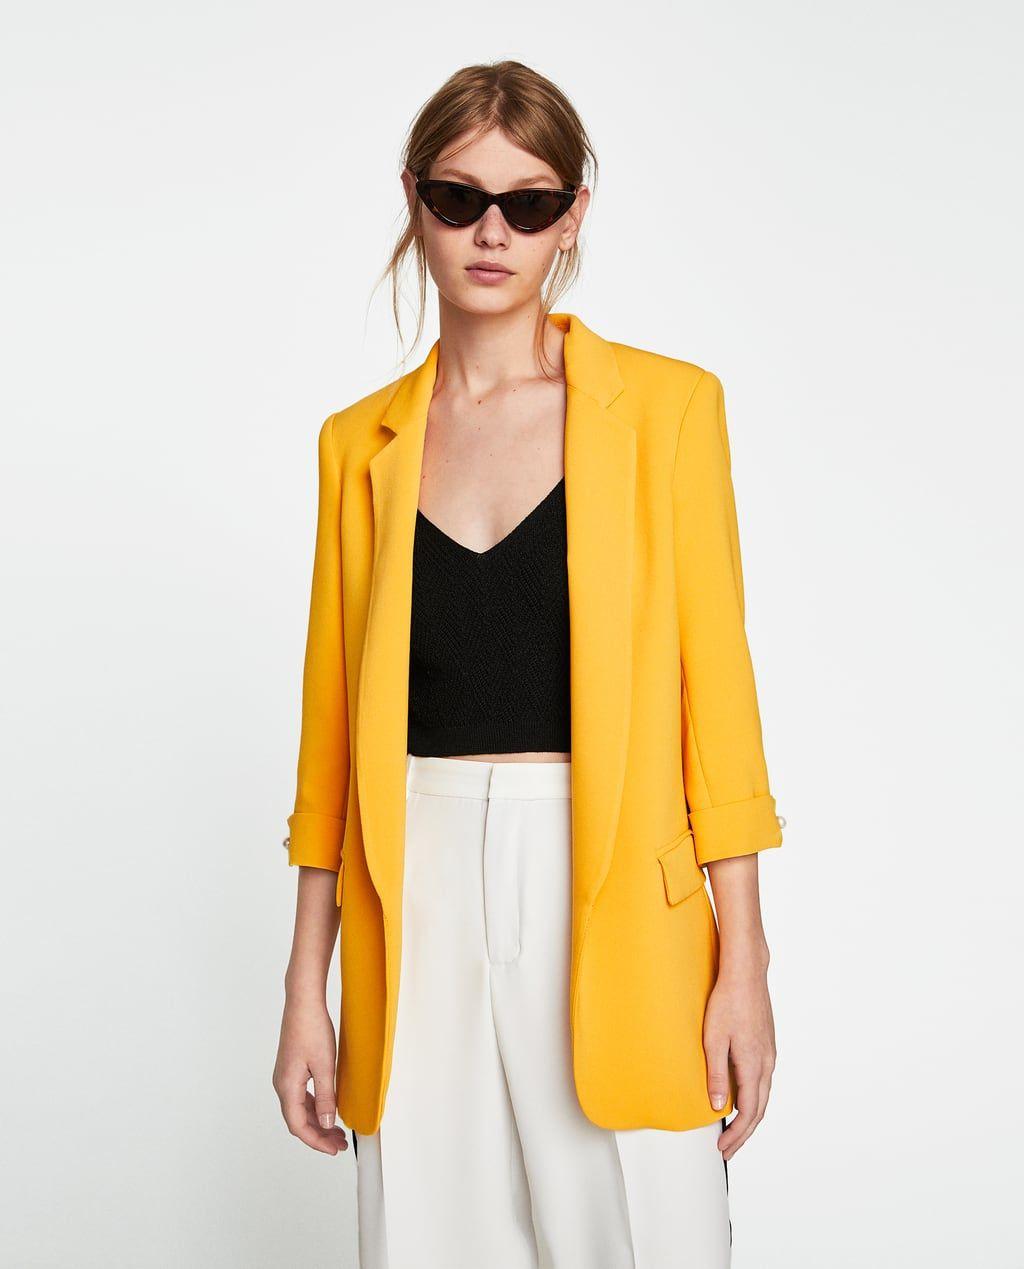 Blazer larga | Blazers | Ropa de moda, Ropa y Moda